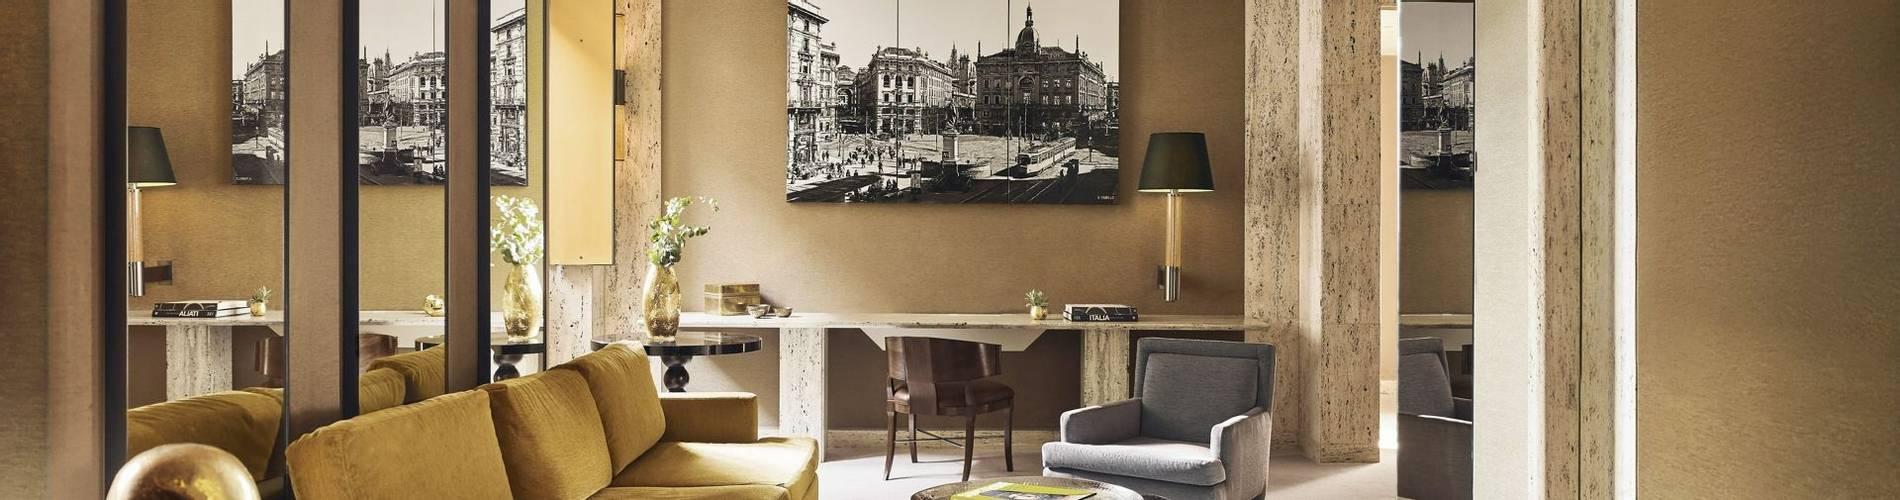 Park-Hyatt-Milan-Prestige-Suite-214-Portrait (1).jpg